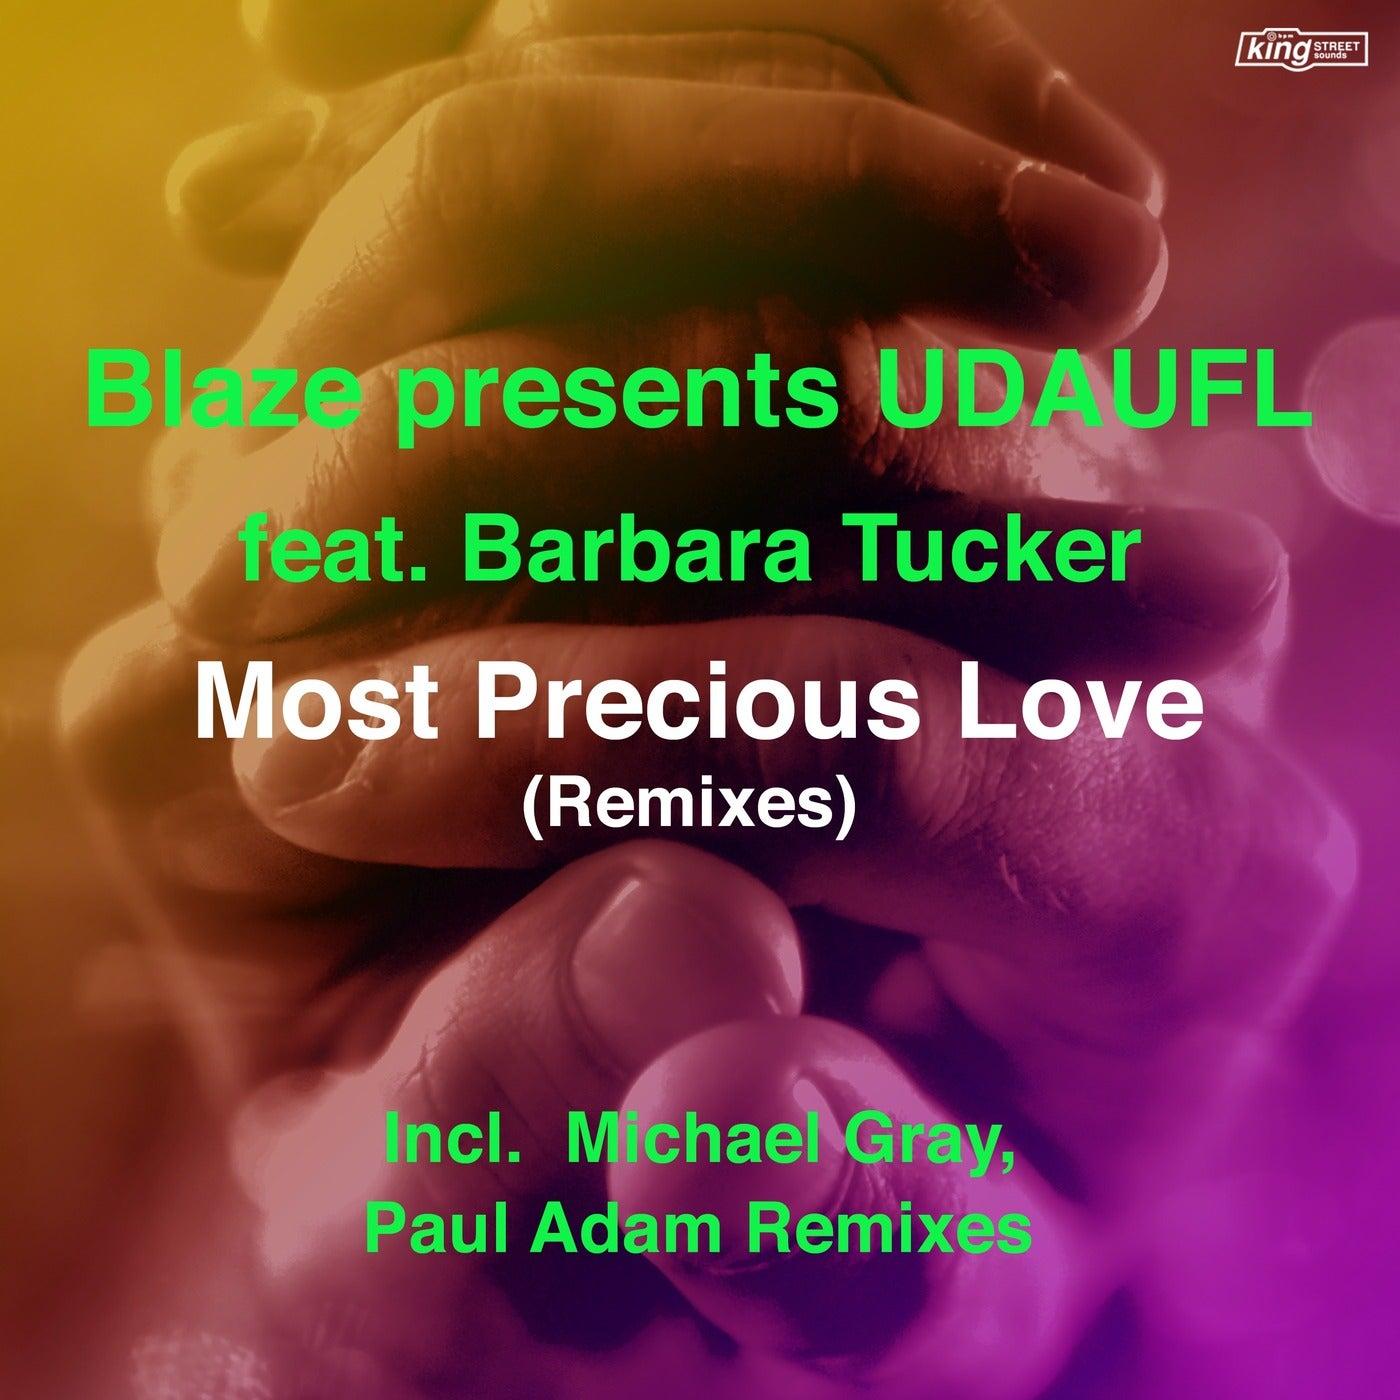 Most Precious Love (Michael Gray Remix)